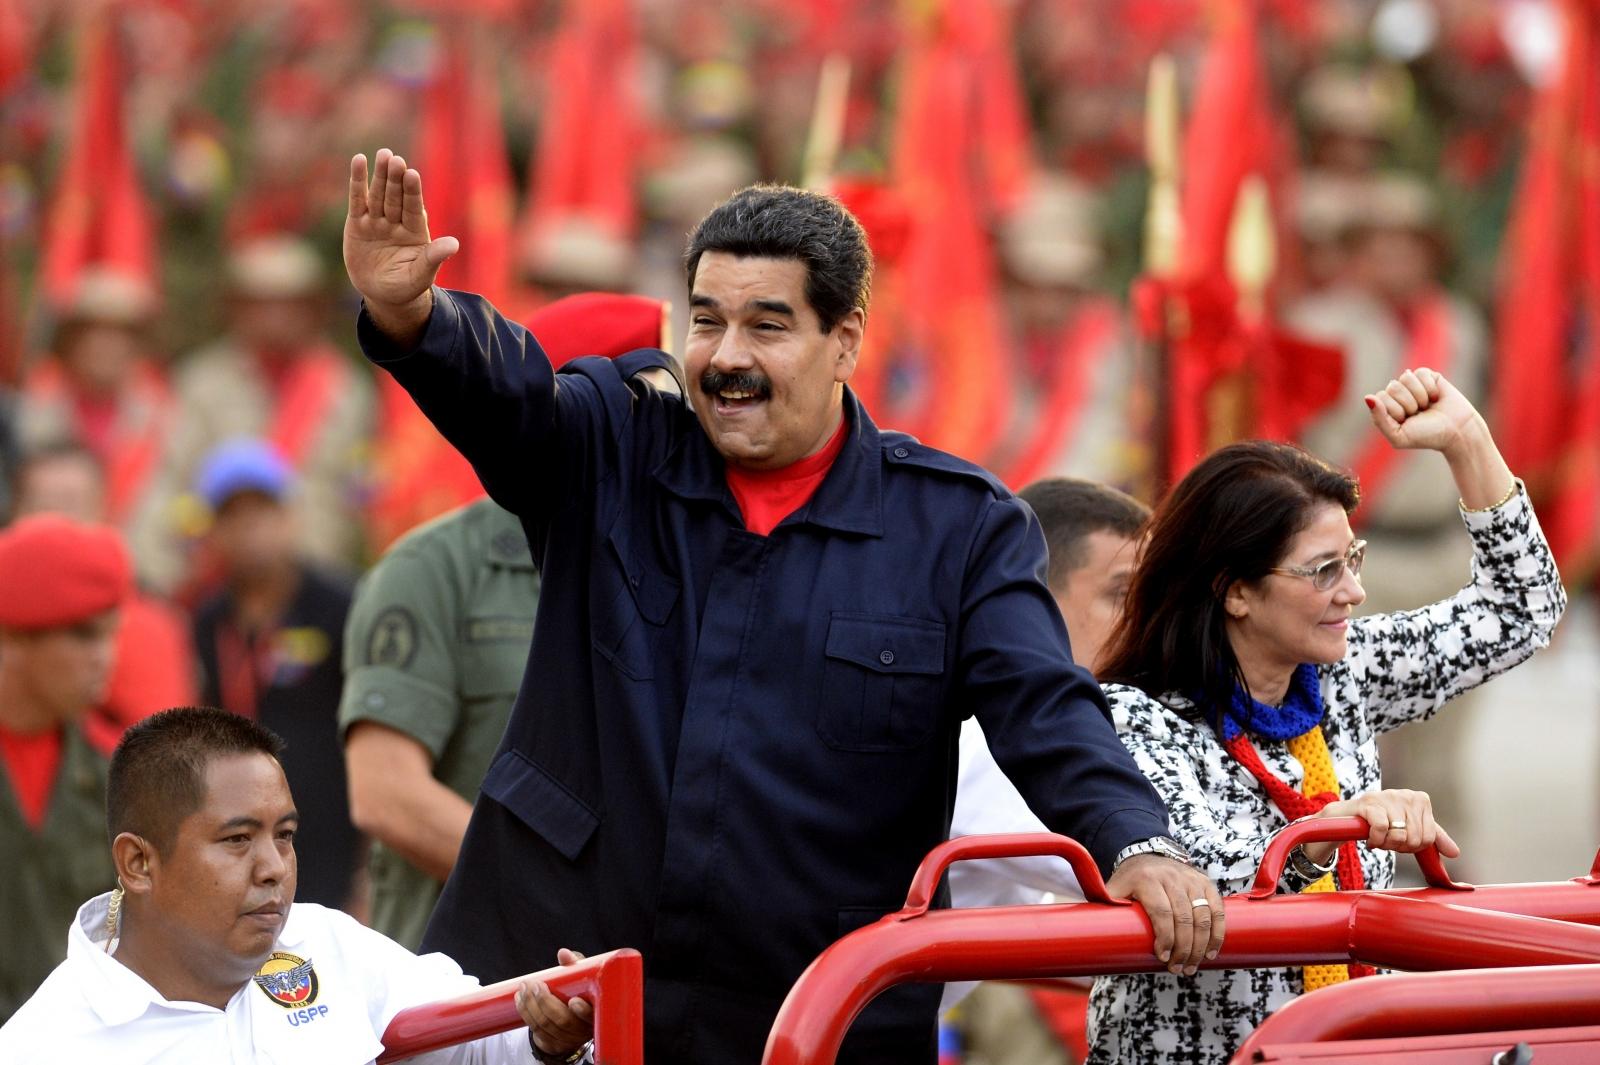 Venezuelan President Nicolas Maduro Double